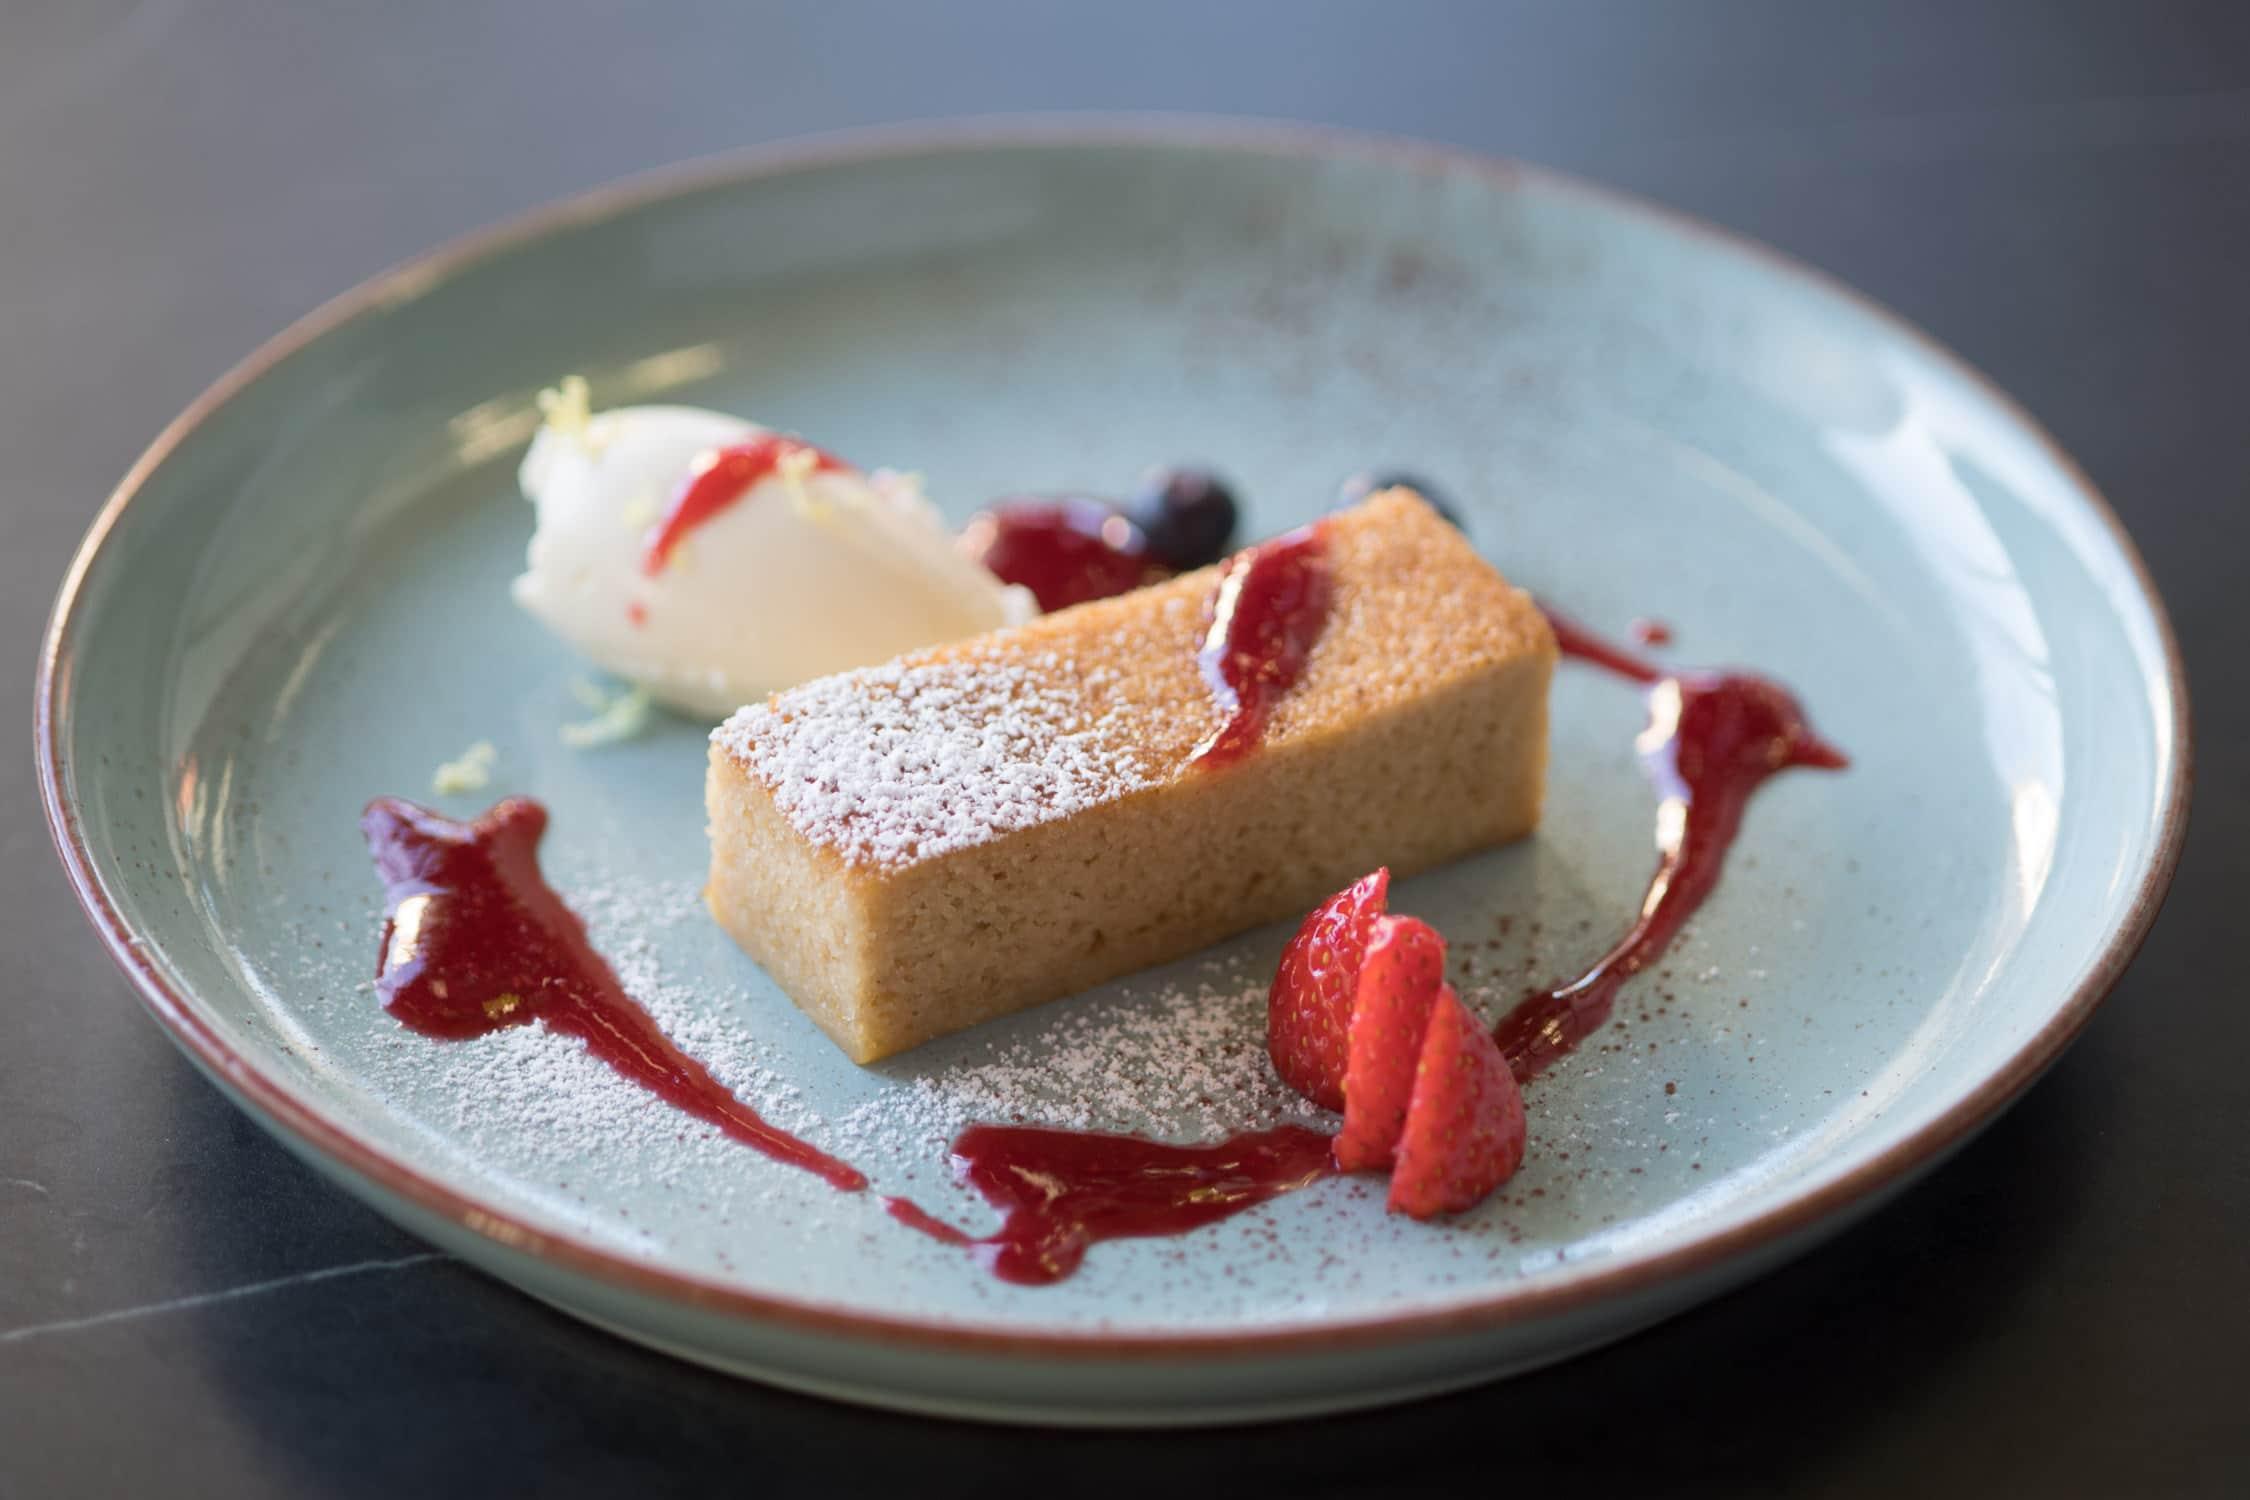 Dessert at Saros Bar + Dining at Moonee Ponds